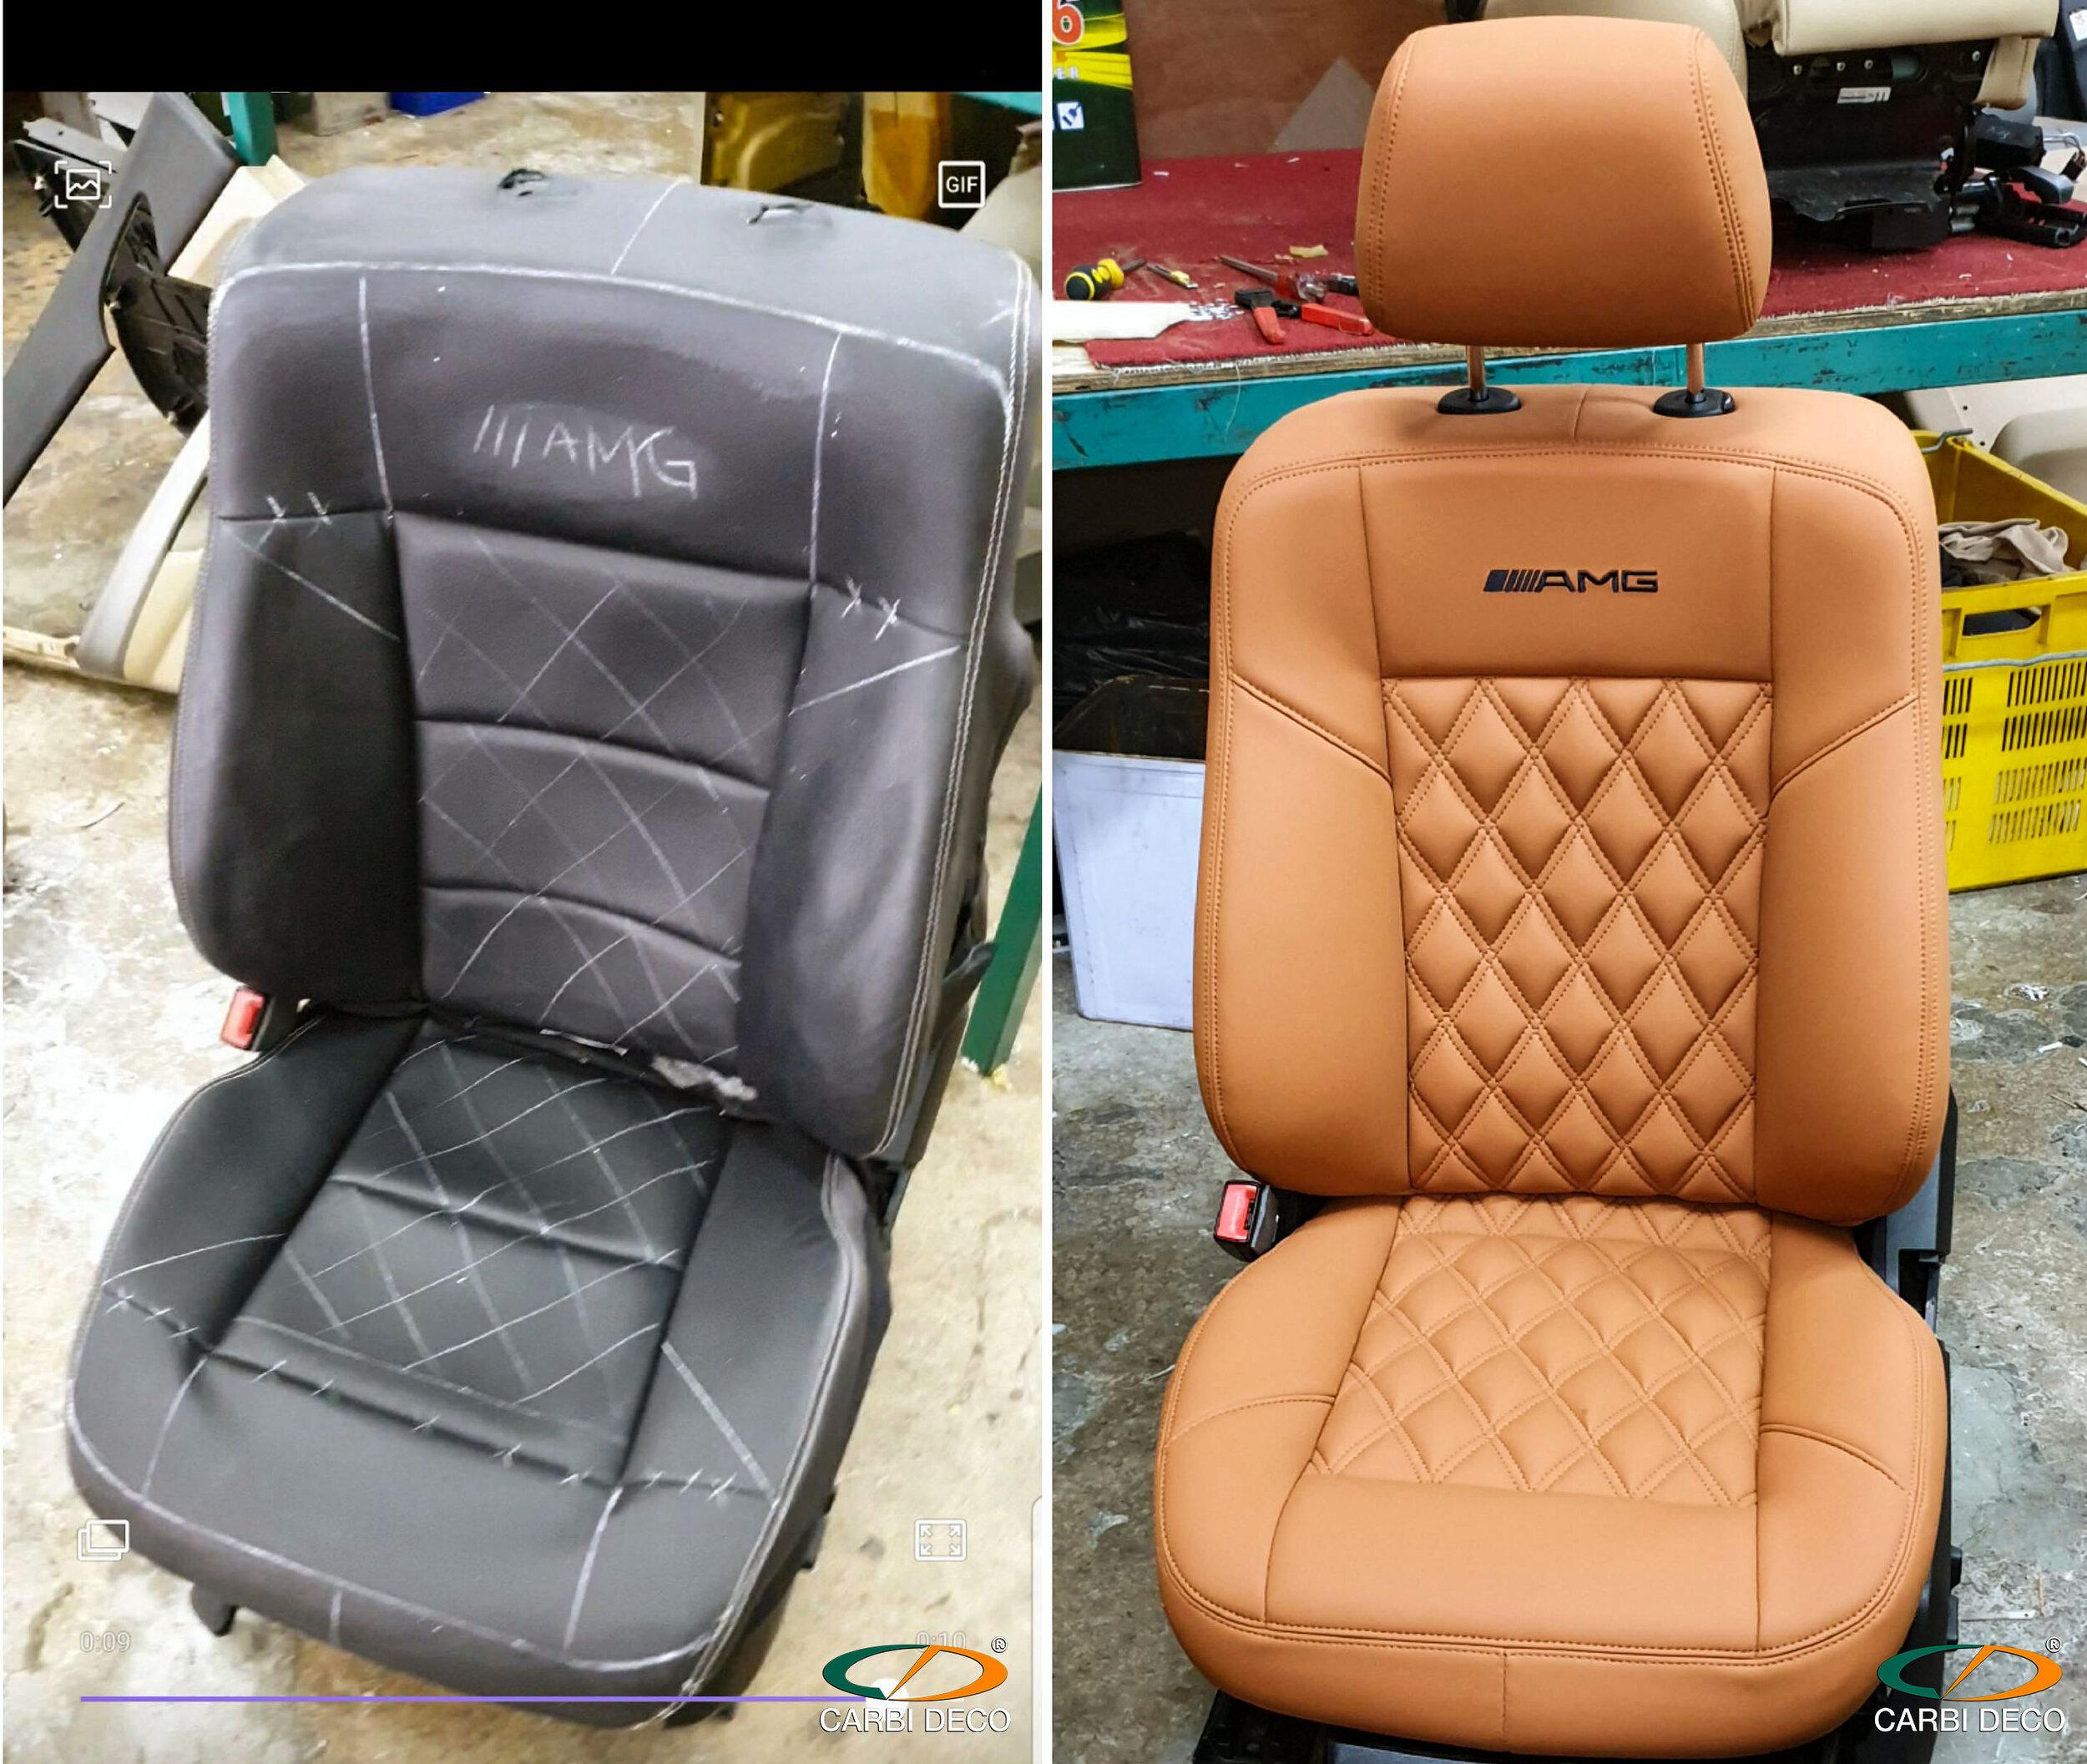 Mercedes W212 Seats